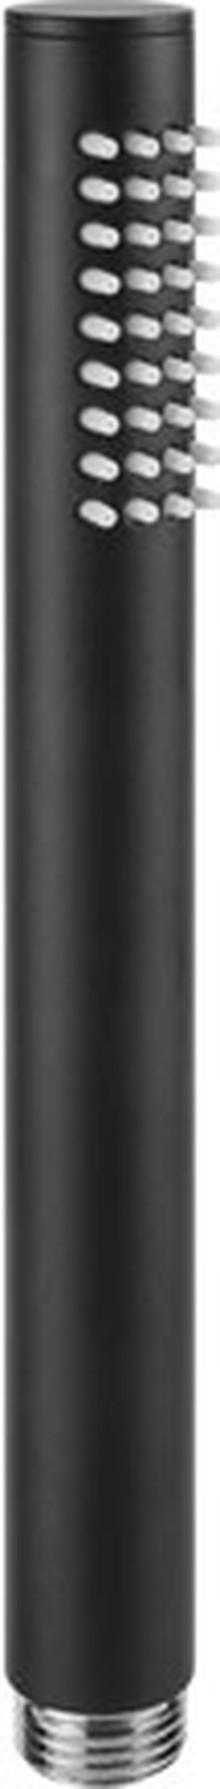 Душевая лейка M&Z ACS550A6